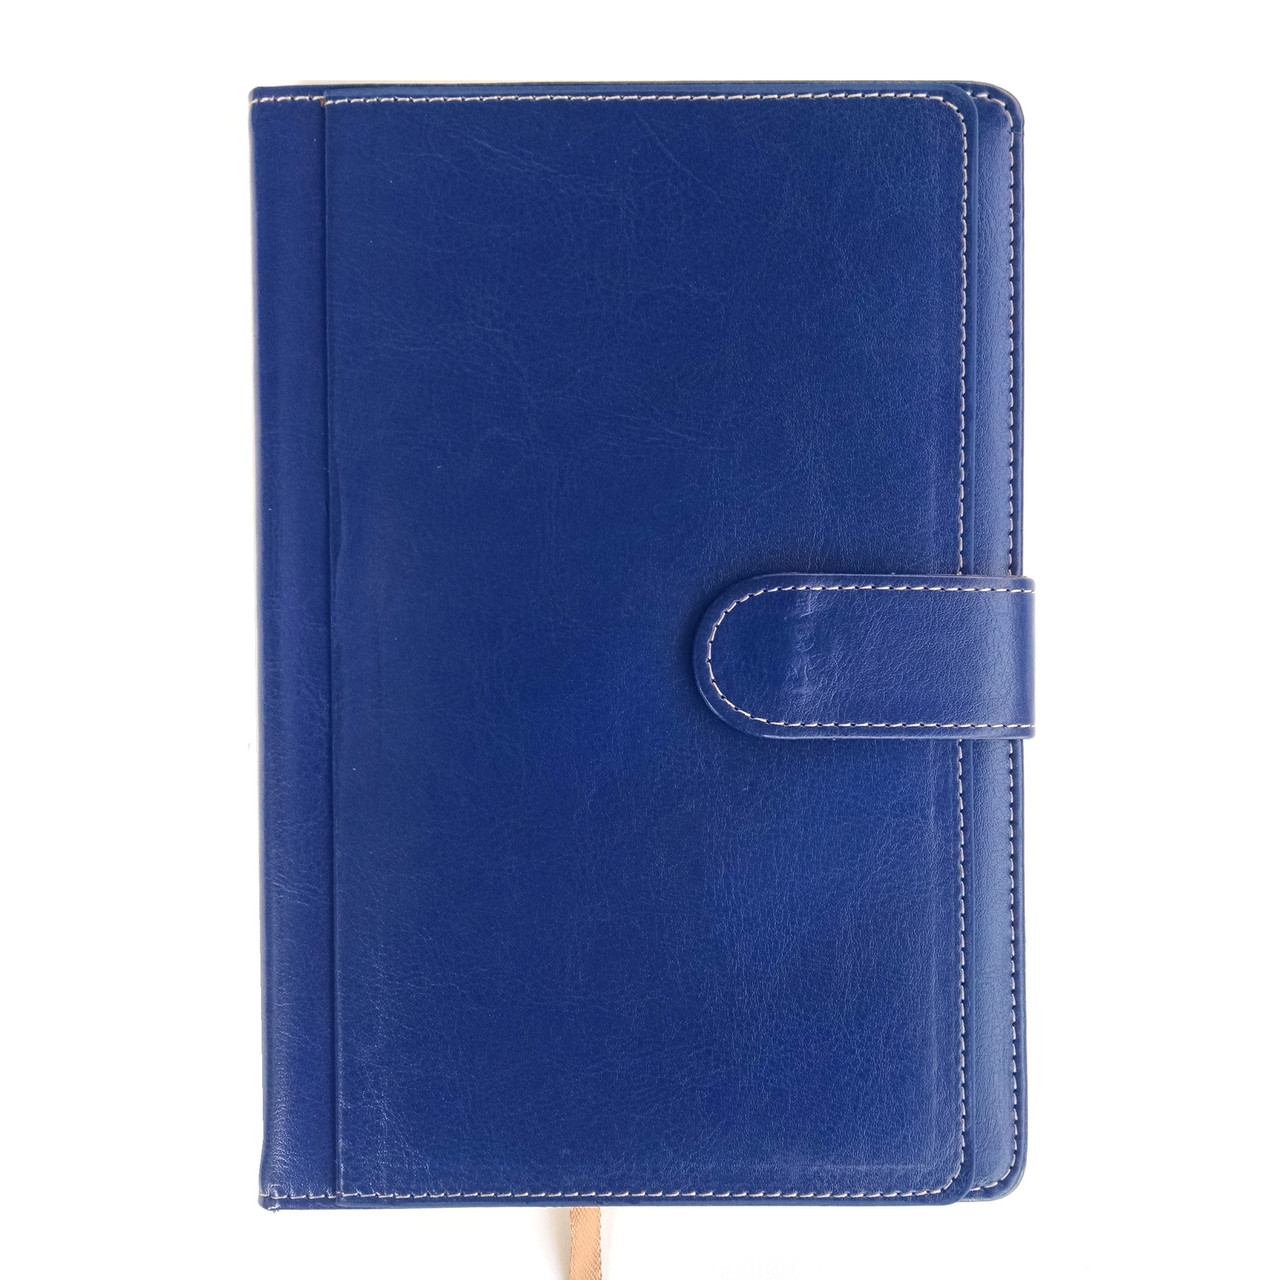 Ежедневник недатированный на магните А5, 150л., клетка №2514, синий с карманами